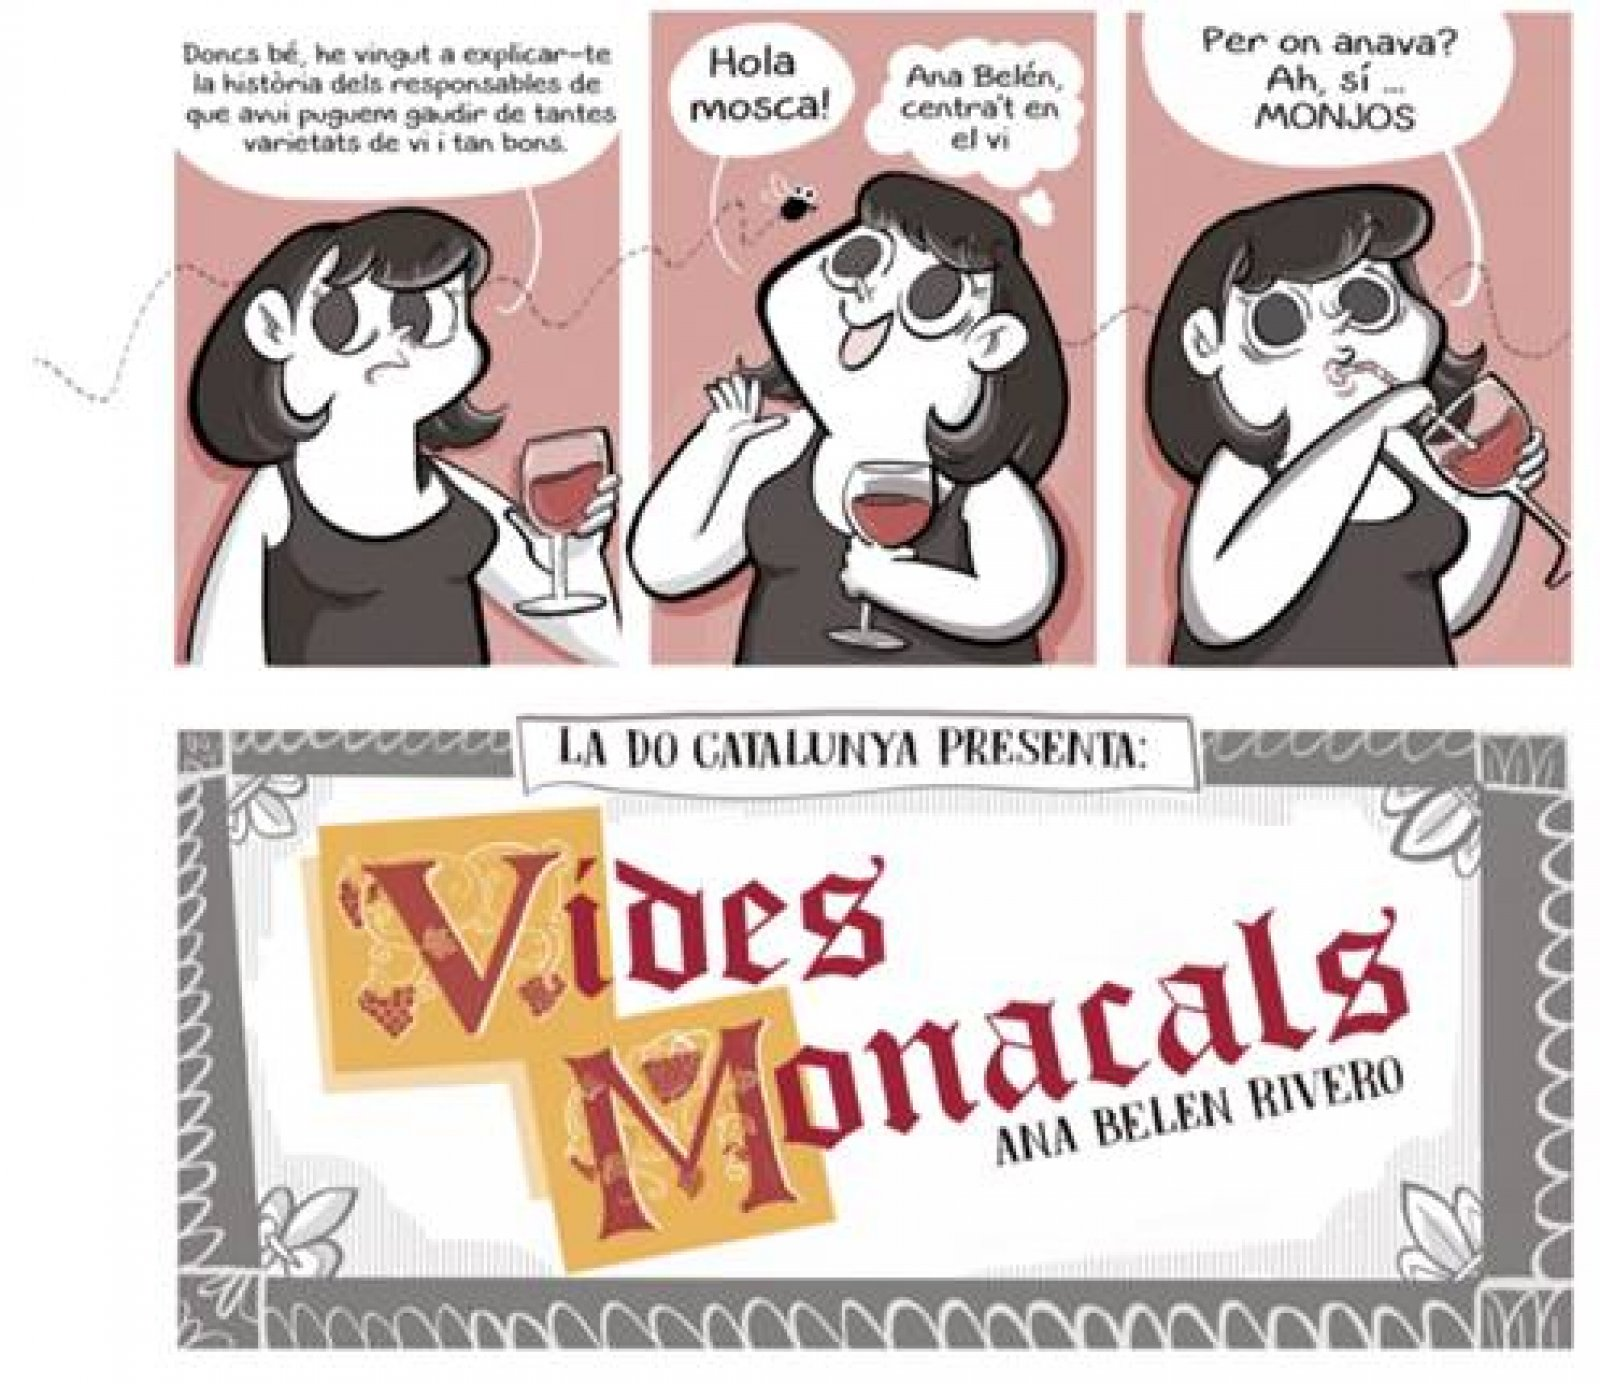 Vides Monacals d'Ana Belén Rivero